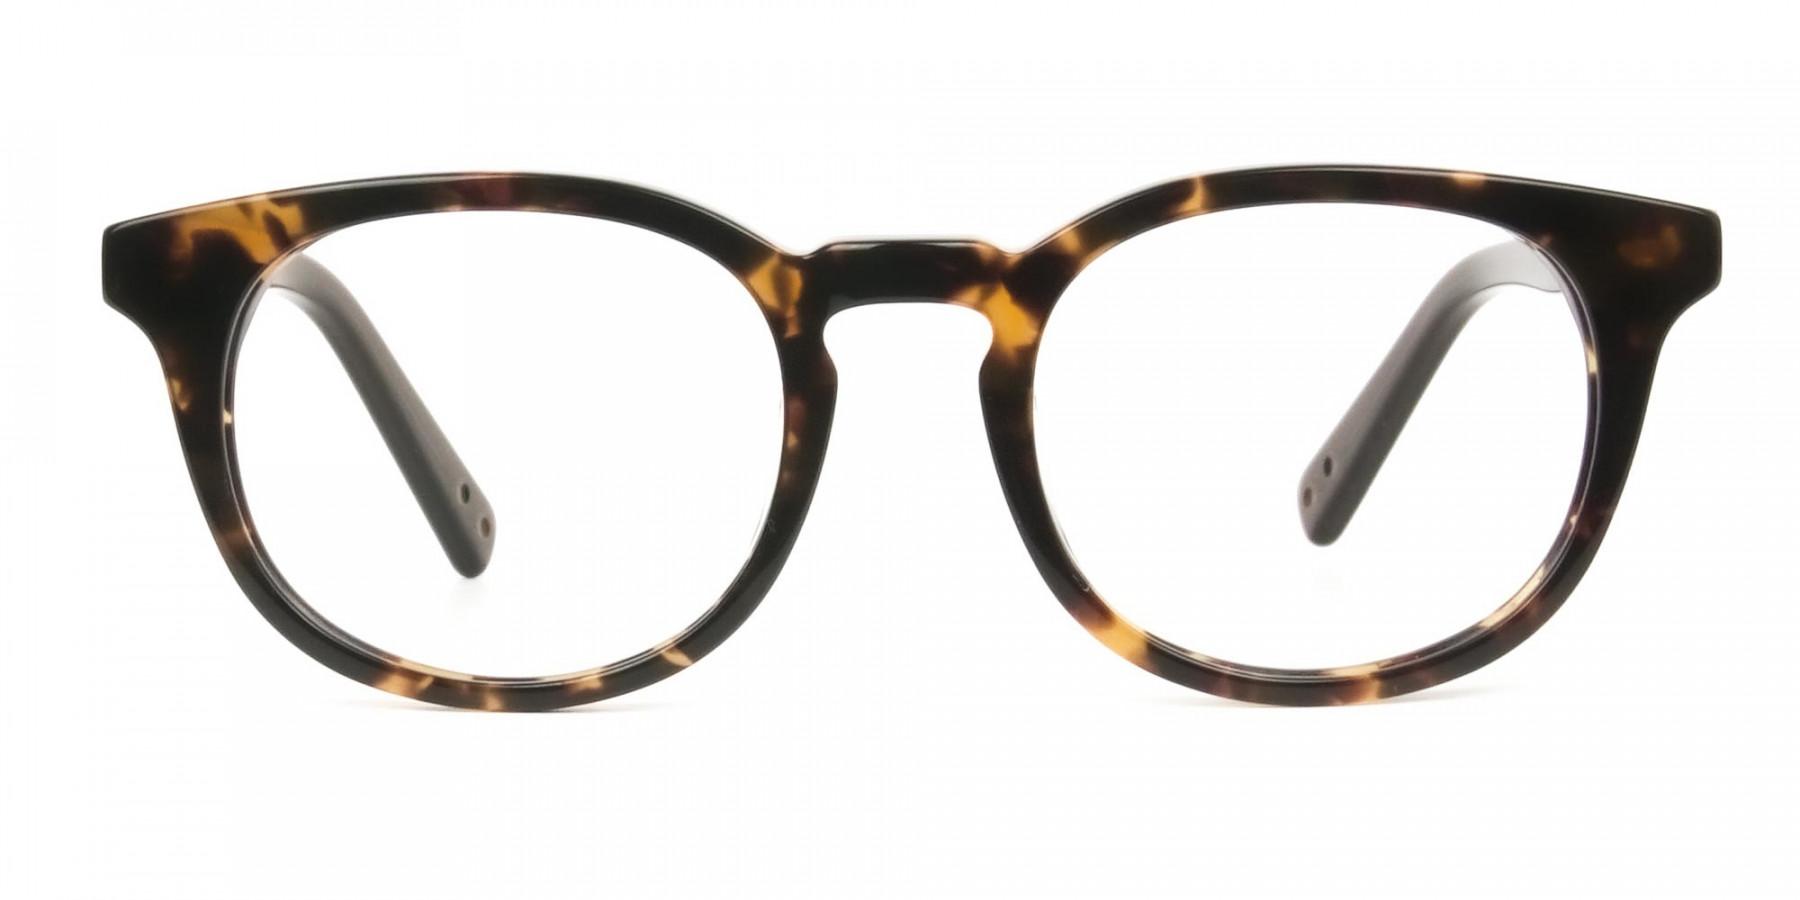 Wayfarer Round Havana & Tortoiseshell Handmade Acetate Glasses - 1